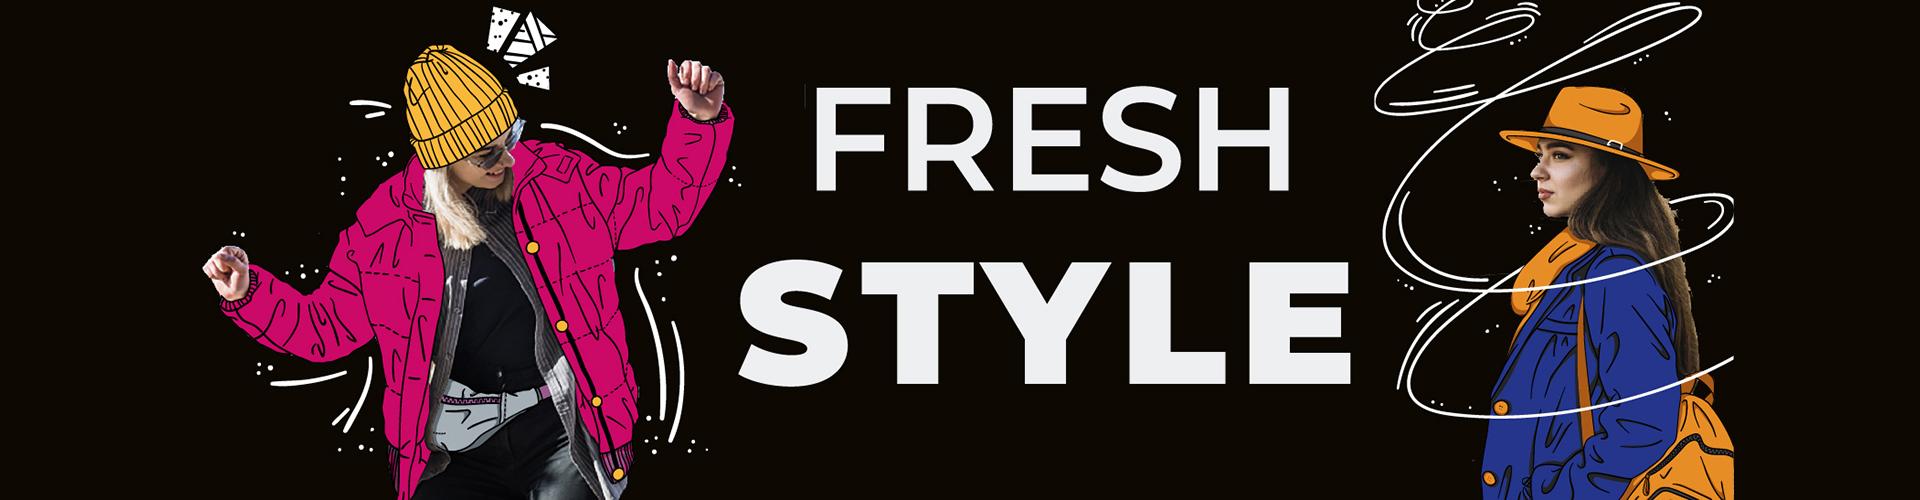 fresh style 1920x500 Купить верхнюю одежду оптом